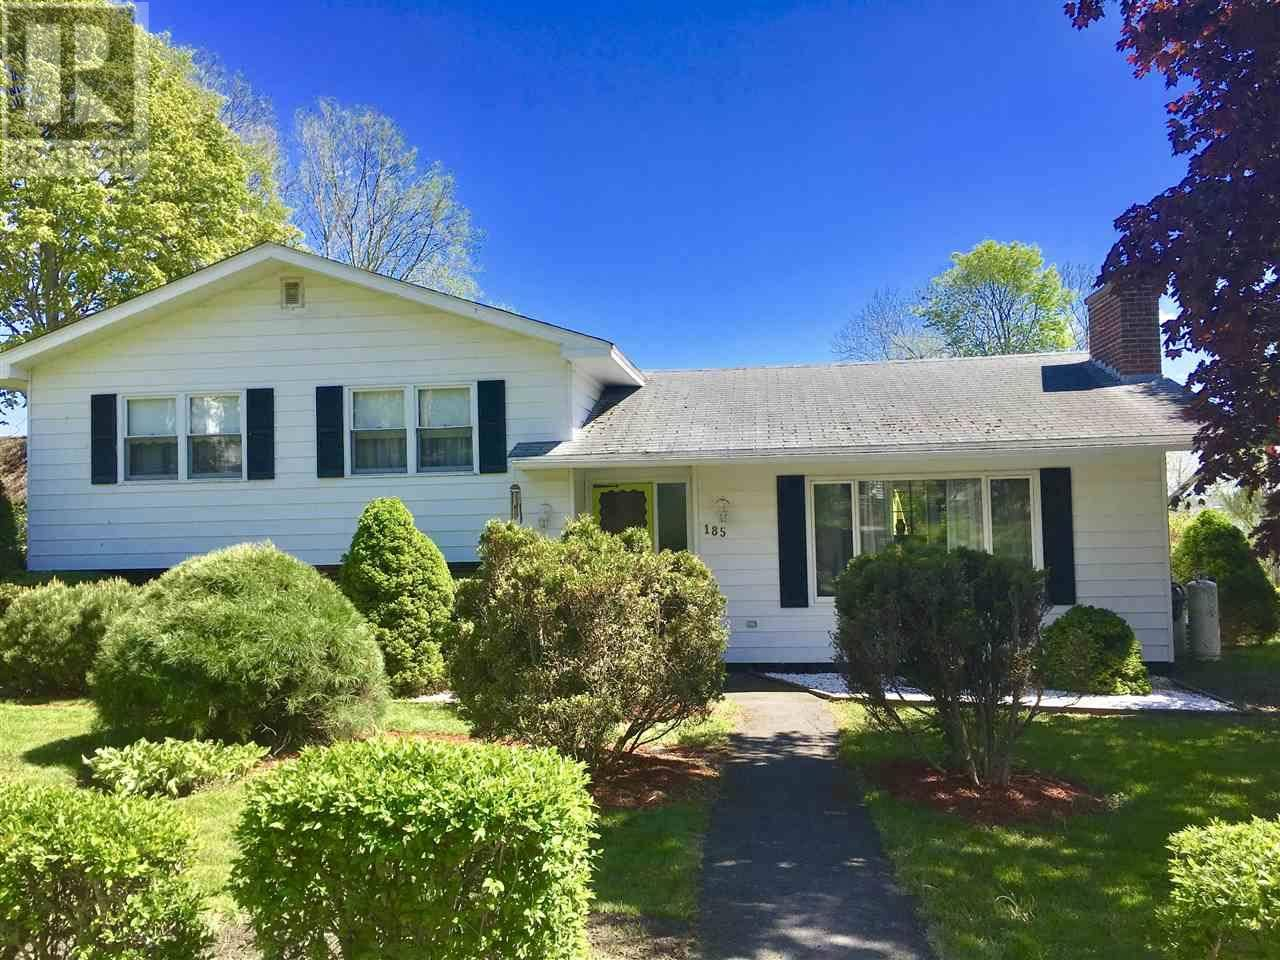 House for sale at 185 Faulkland St Pictou Nova Scotia - MLS: 202006711